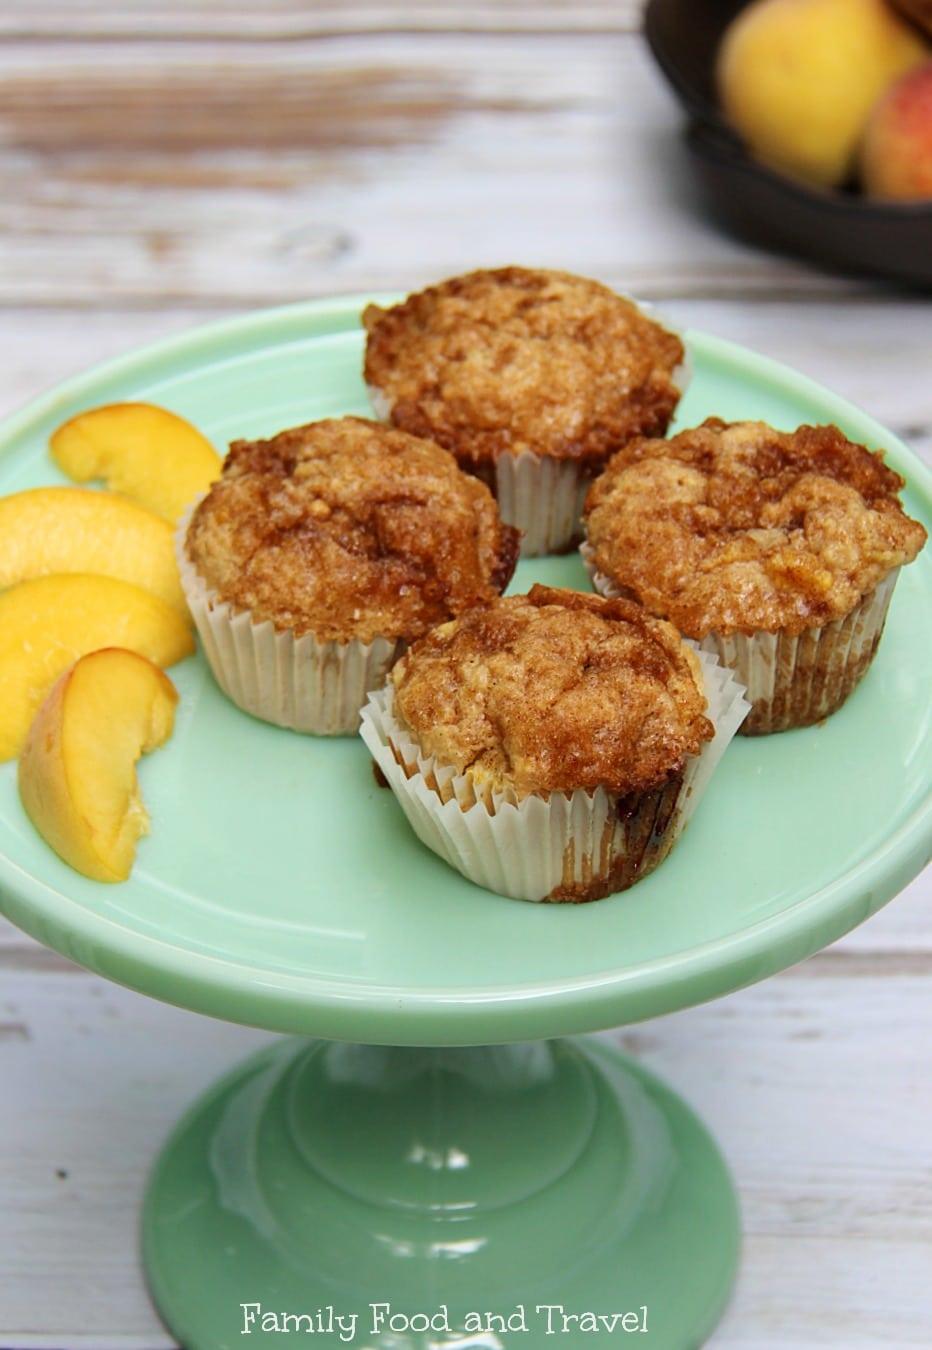 Peaches and Cream Oatmeal Muffins